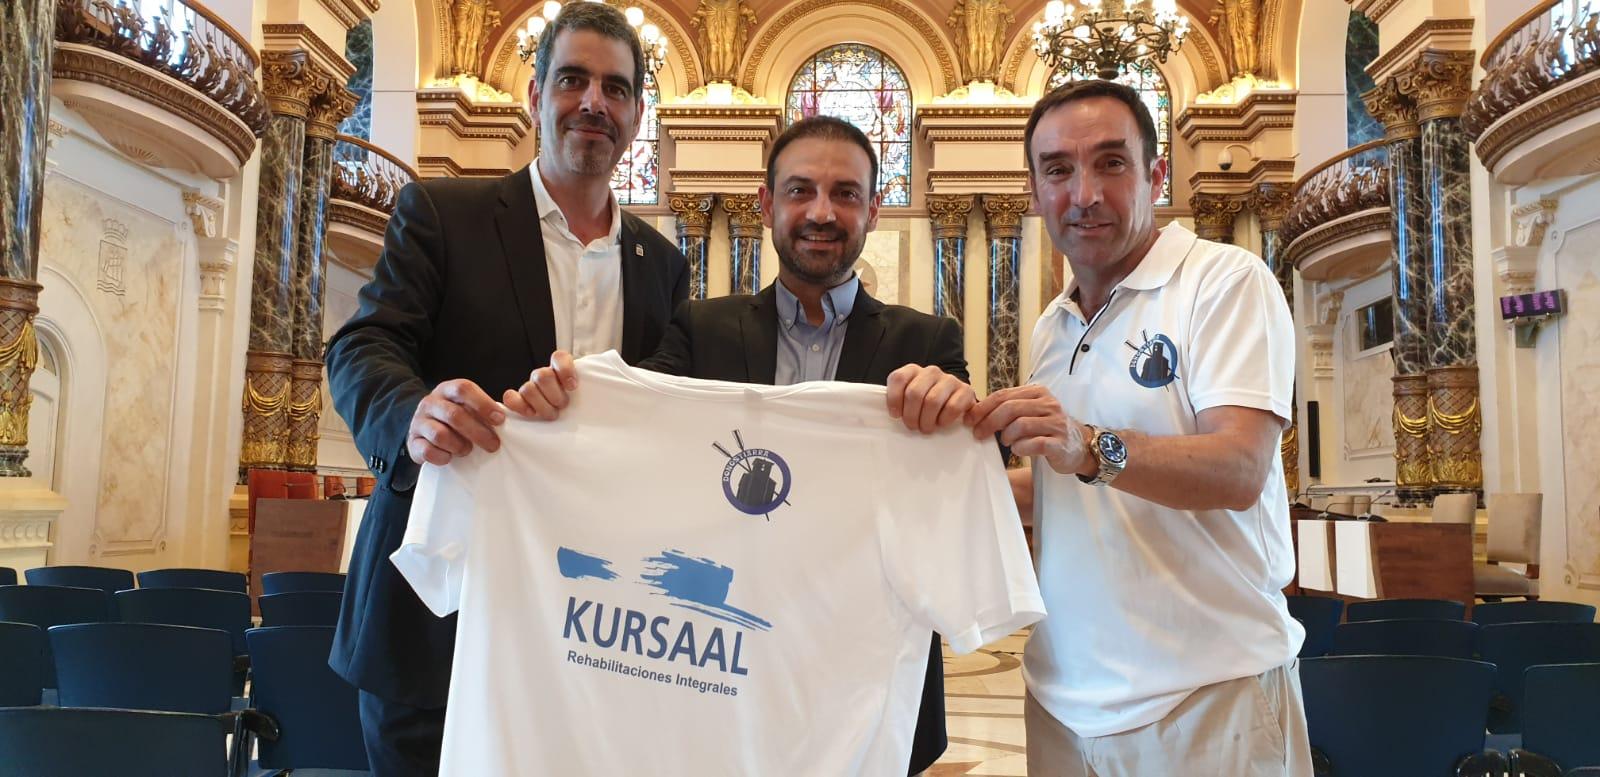 imagen 4 de noticia: kursaal-rehabilitaciones-apoya-al-club-de-remo-donostiarra